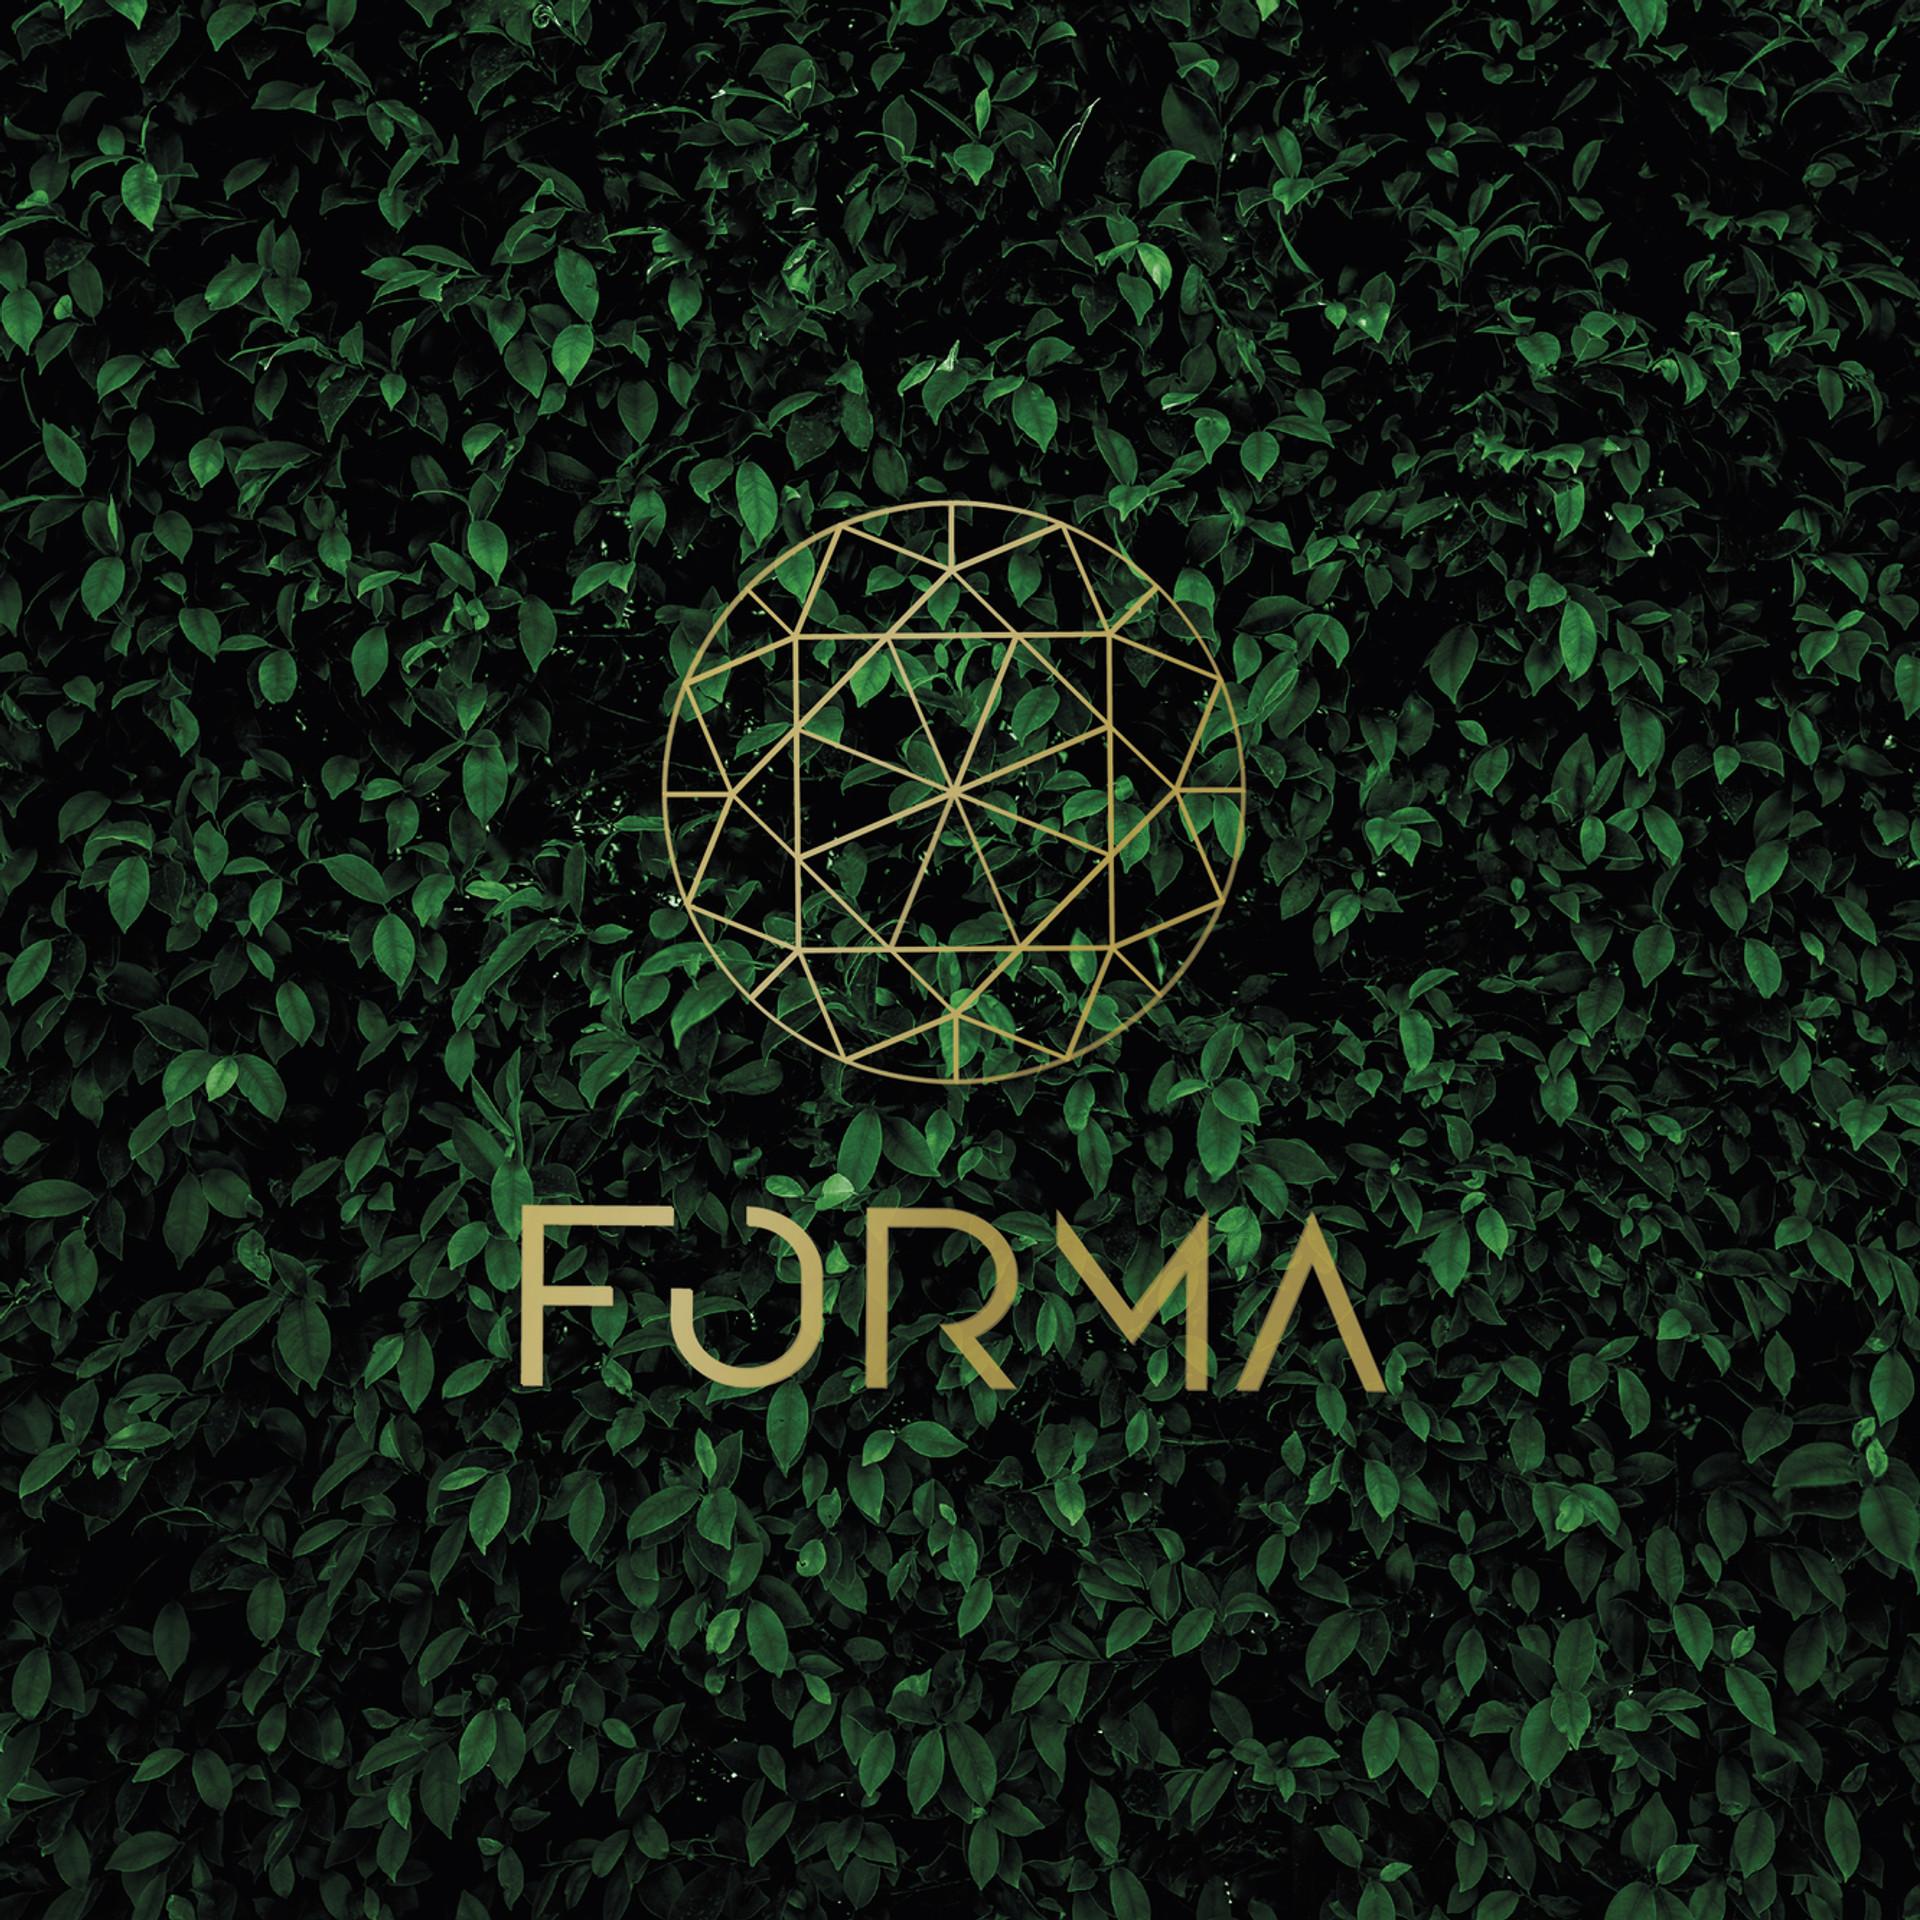 forma-vefur-HH.jpg